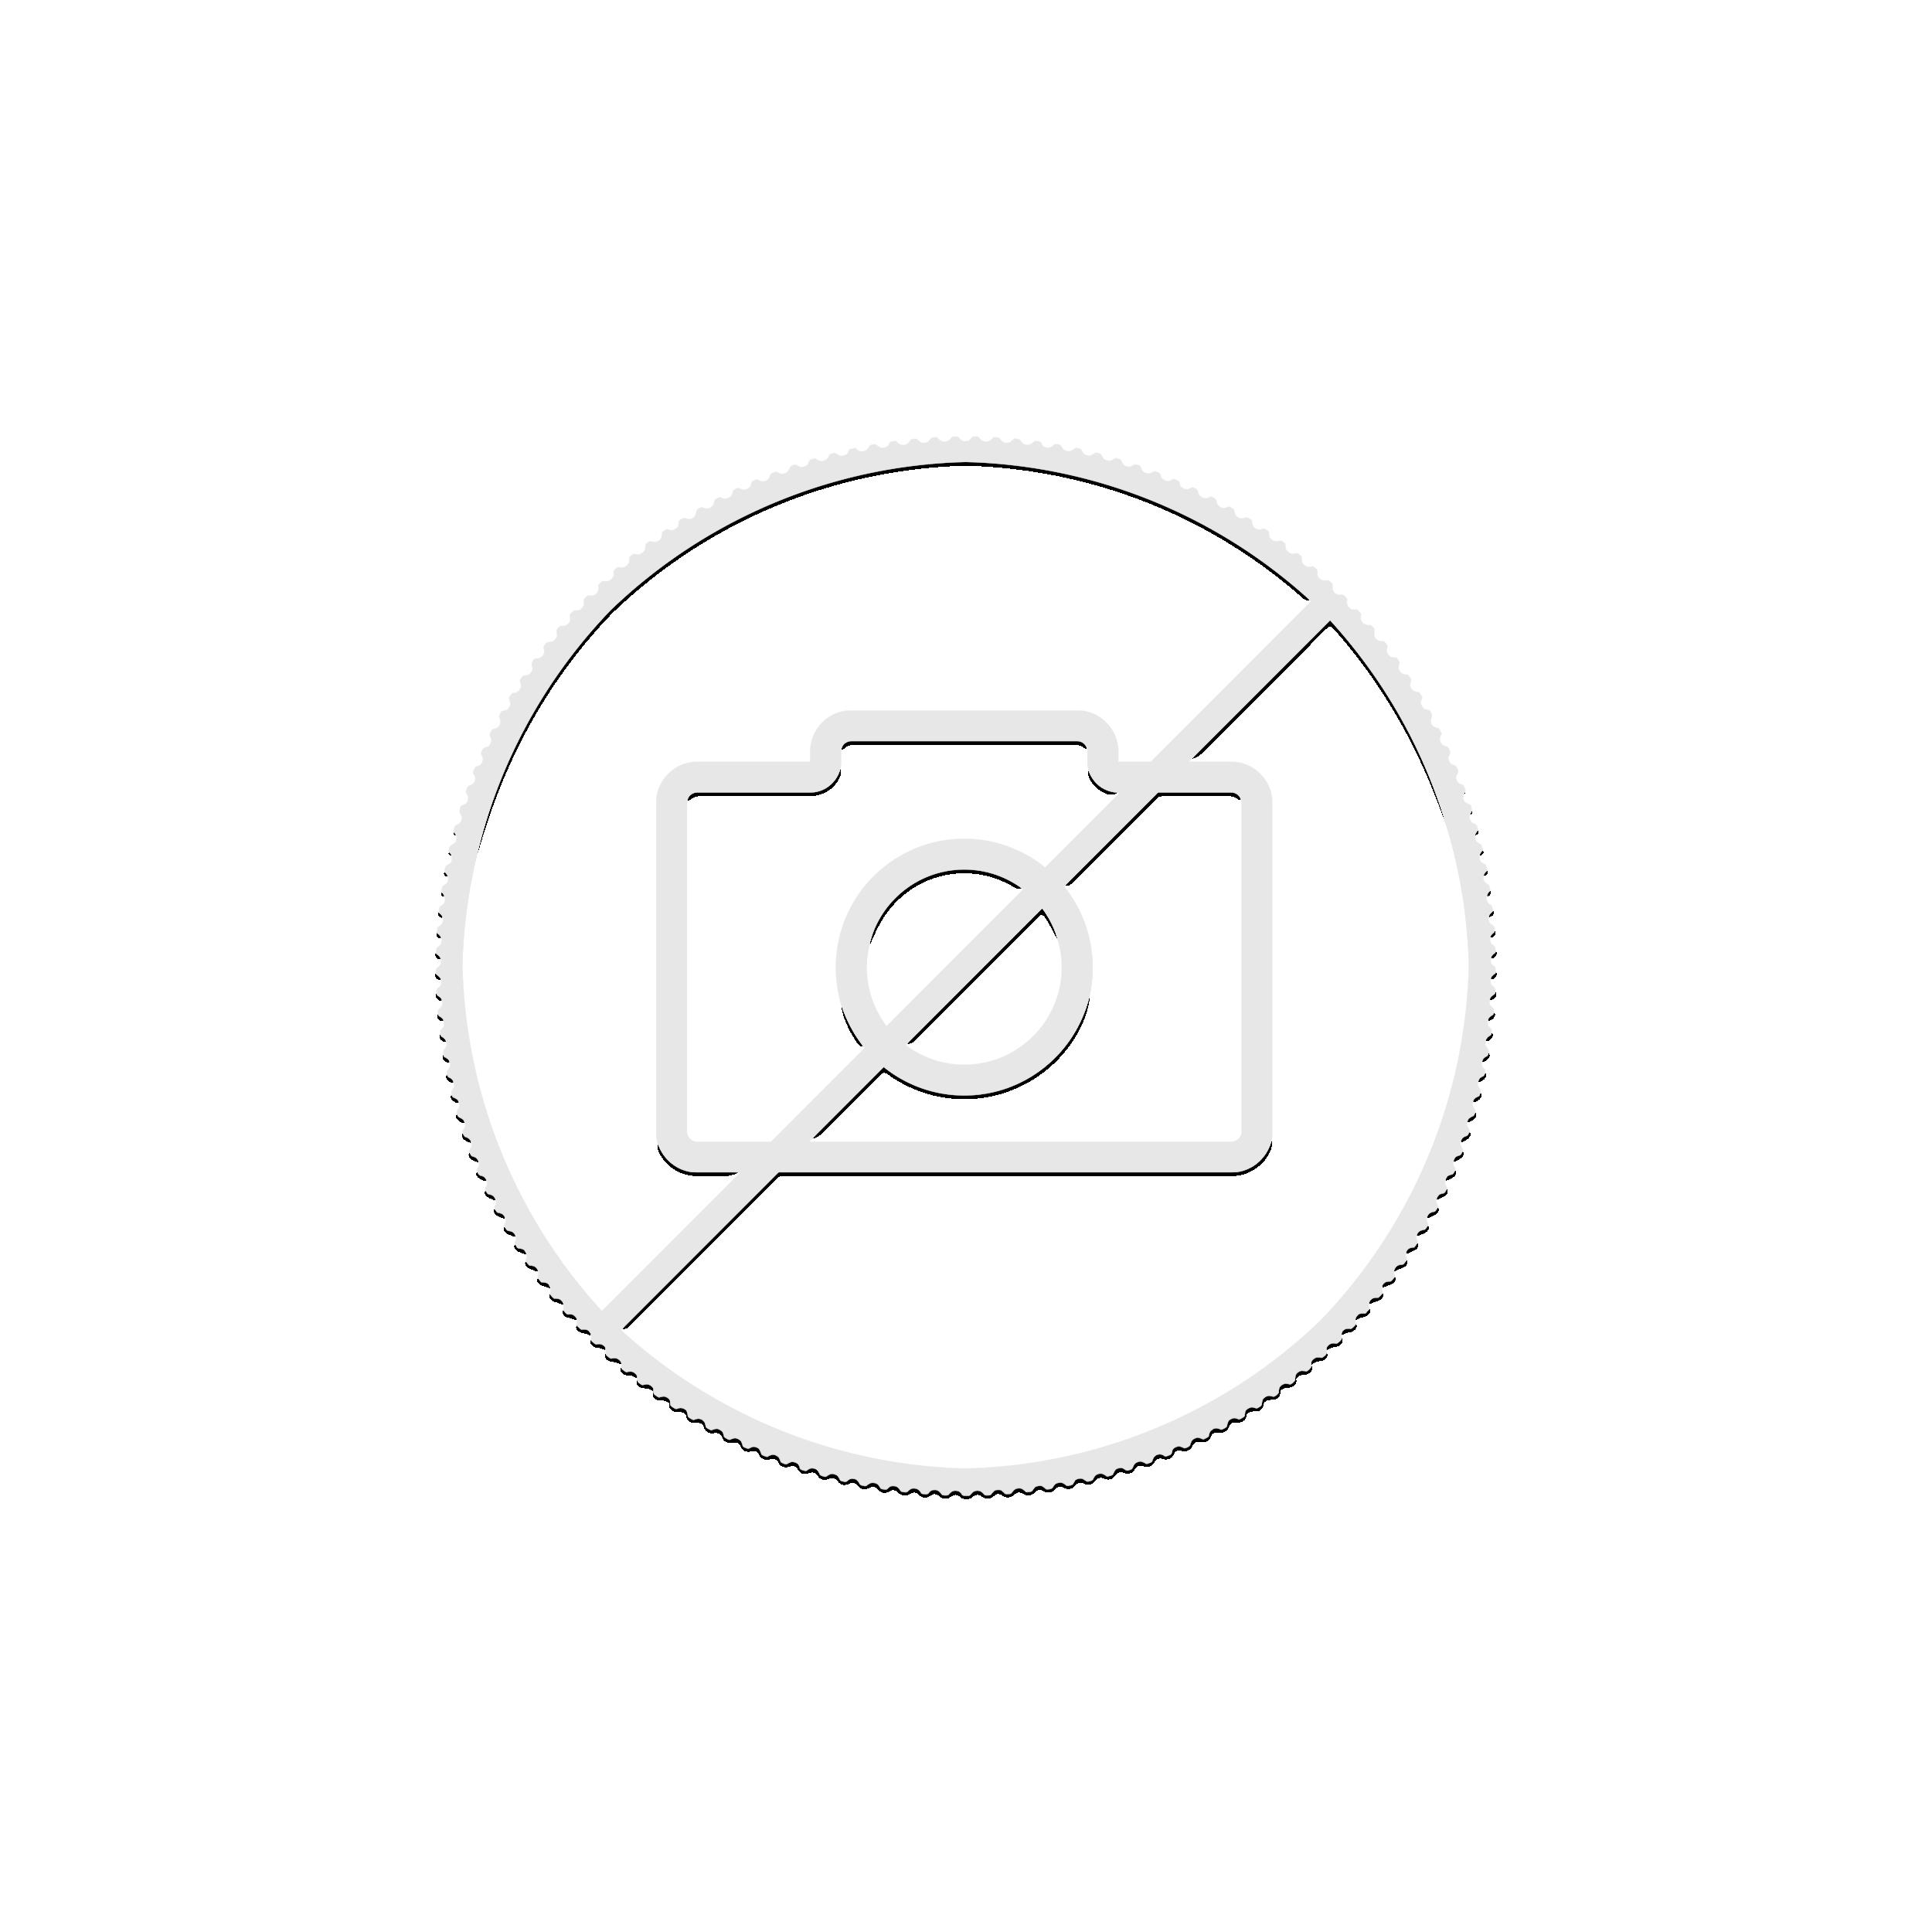 2 troy ounce zilveren munt Platypus Next Generations 2021